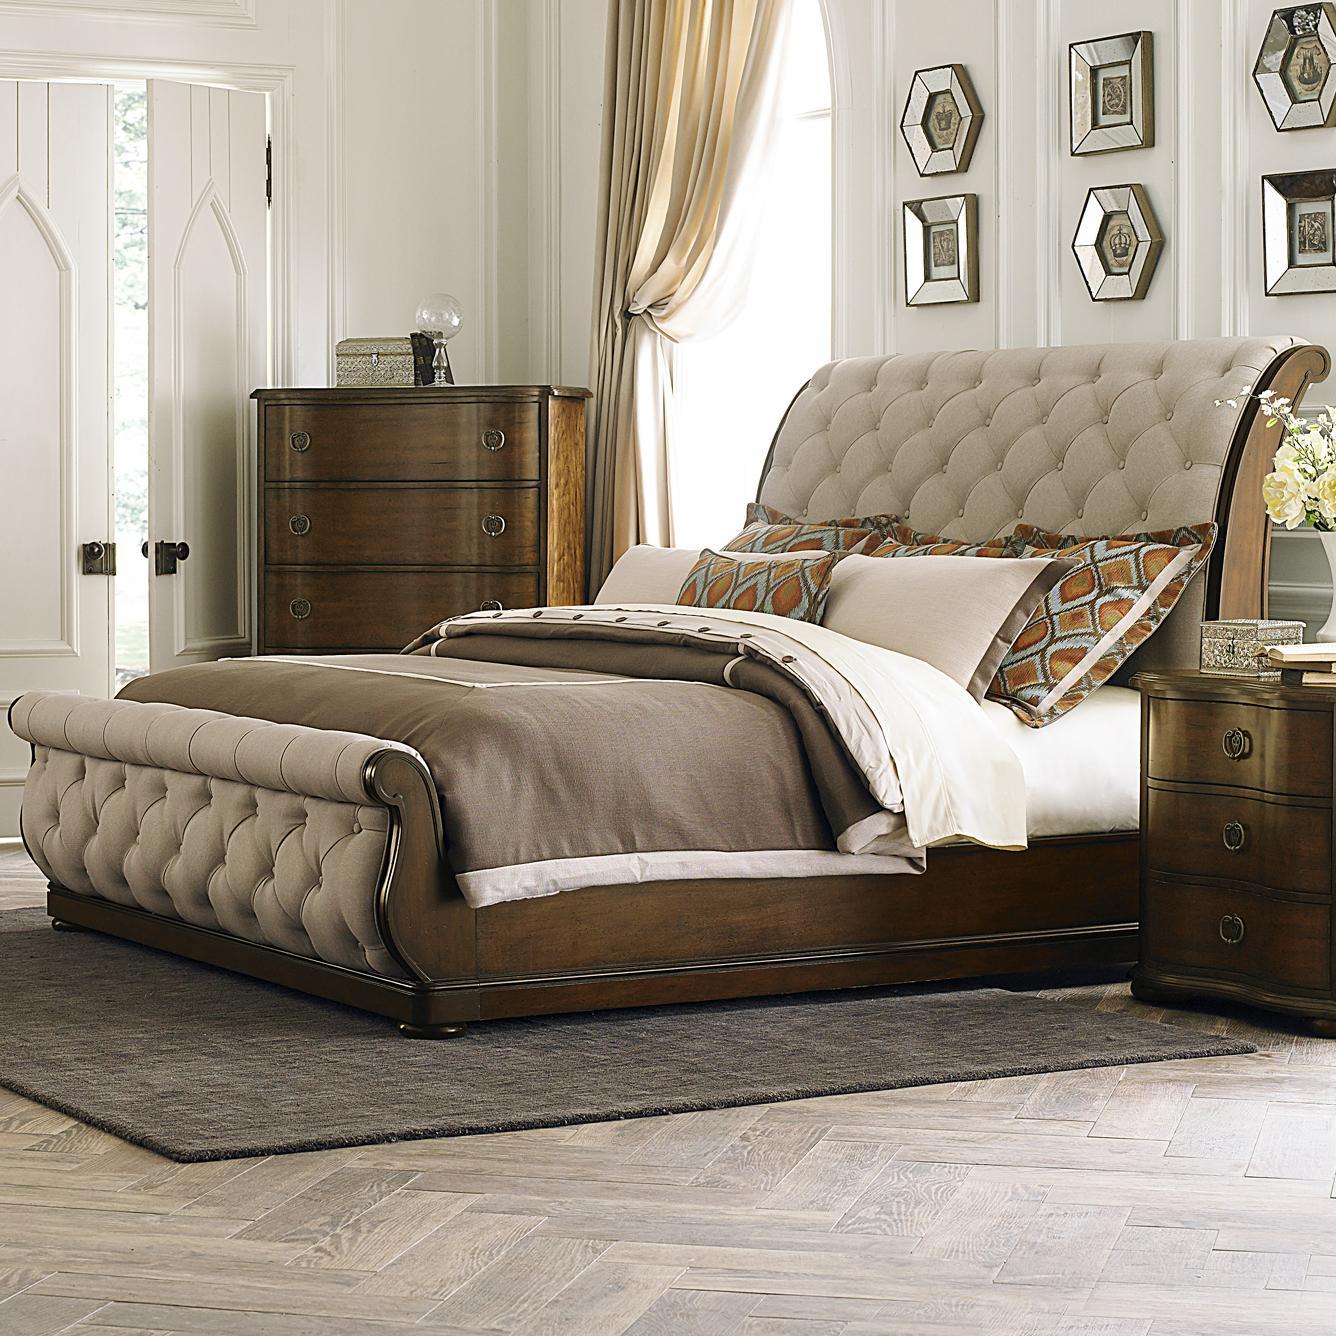 Liberty furniture cotswold king sleigh bed item number 545 br ksl